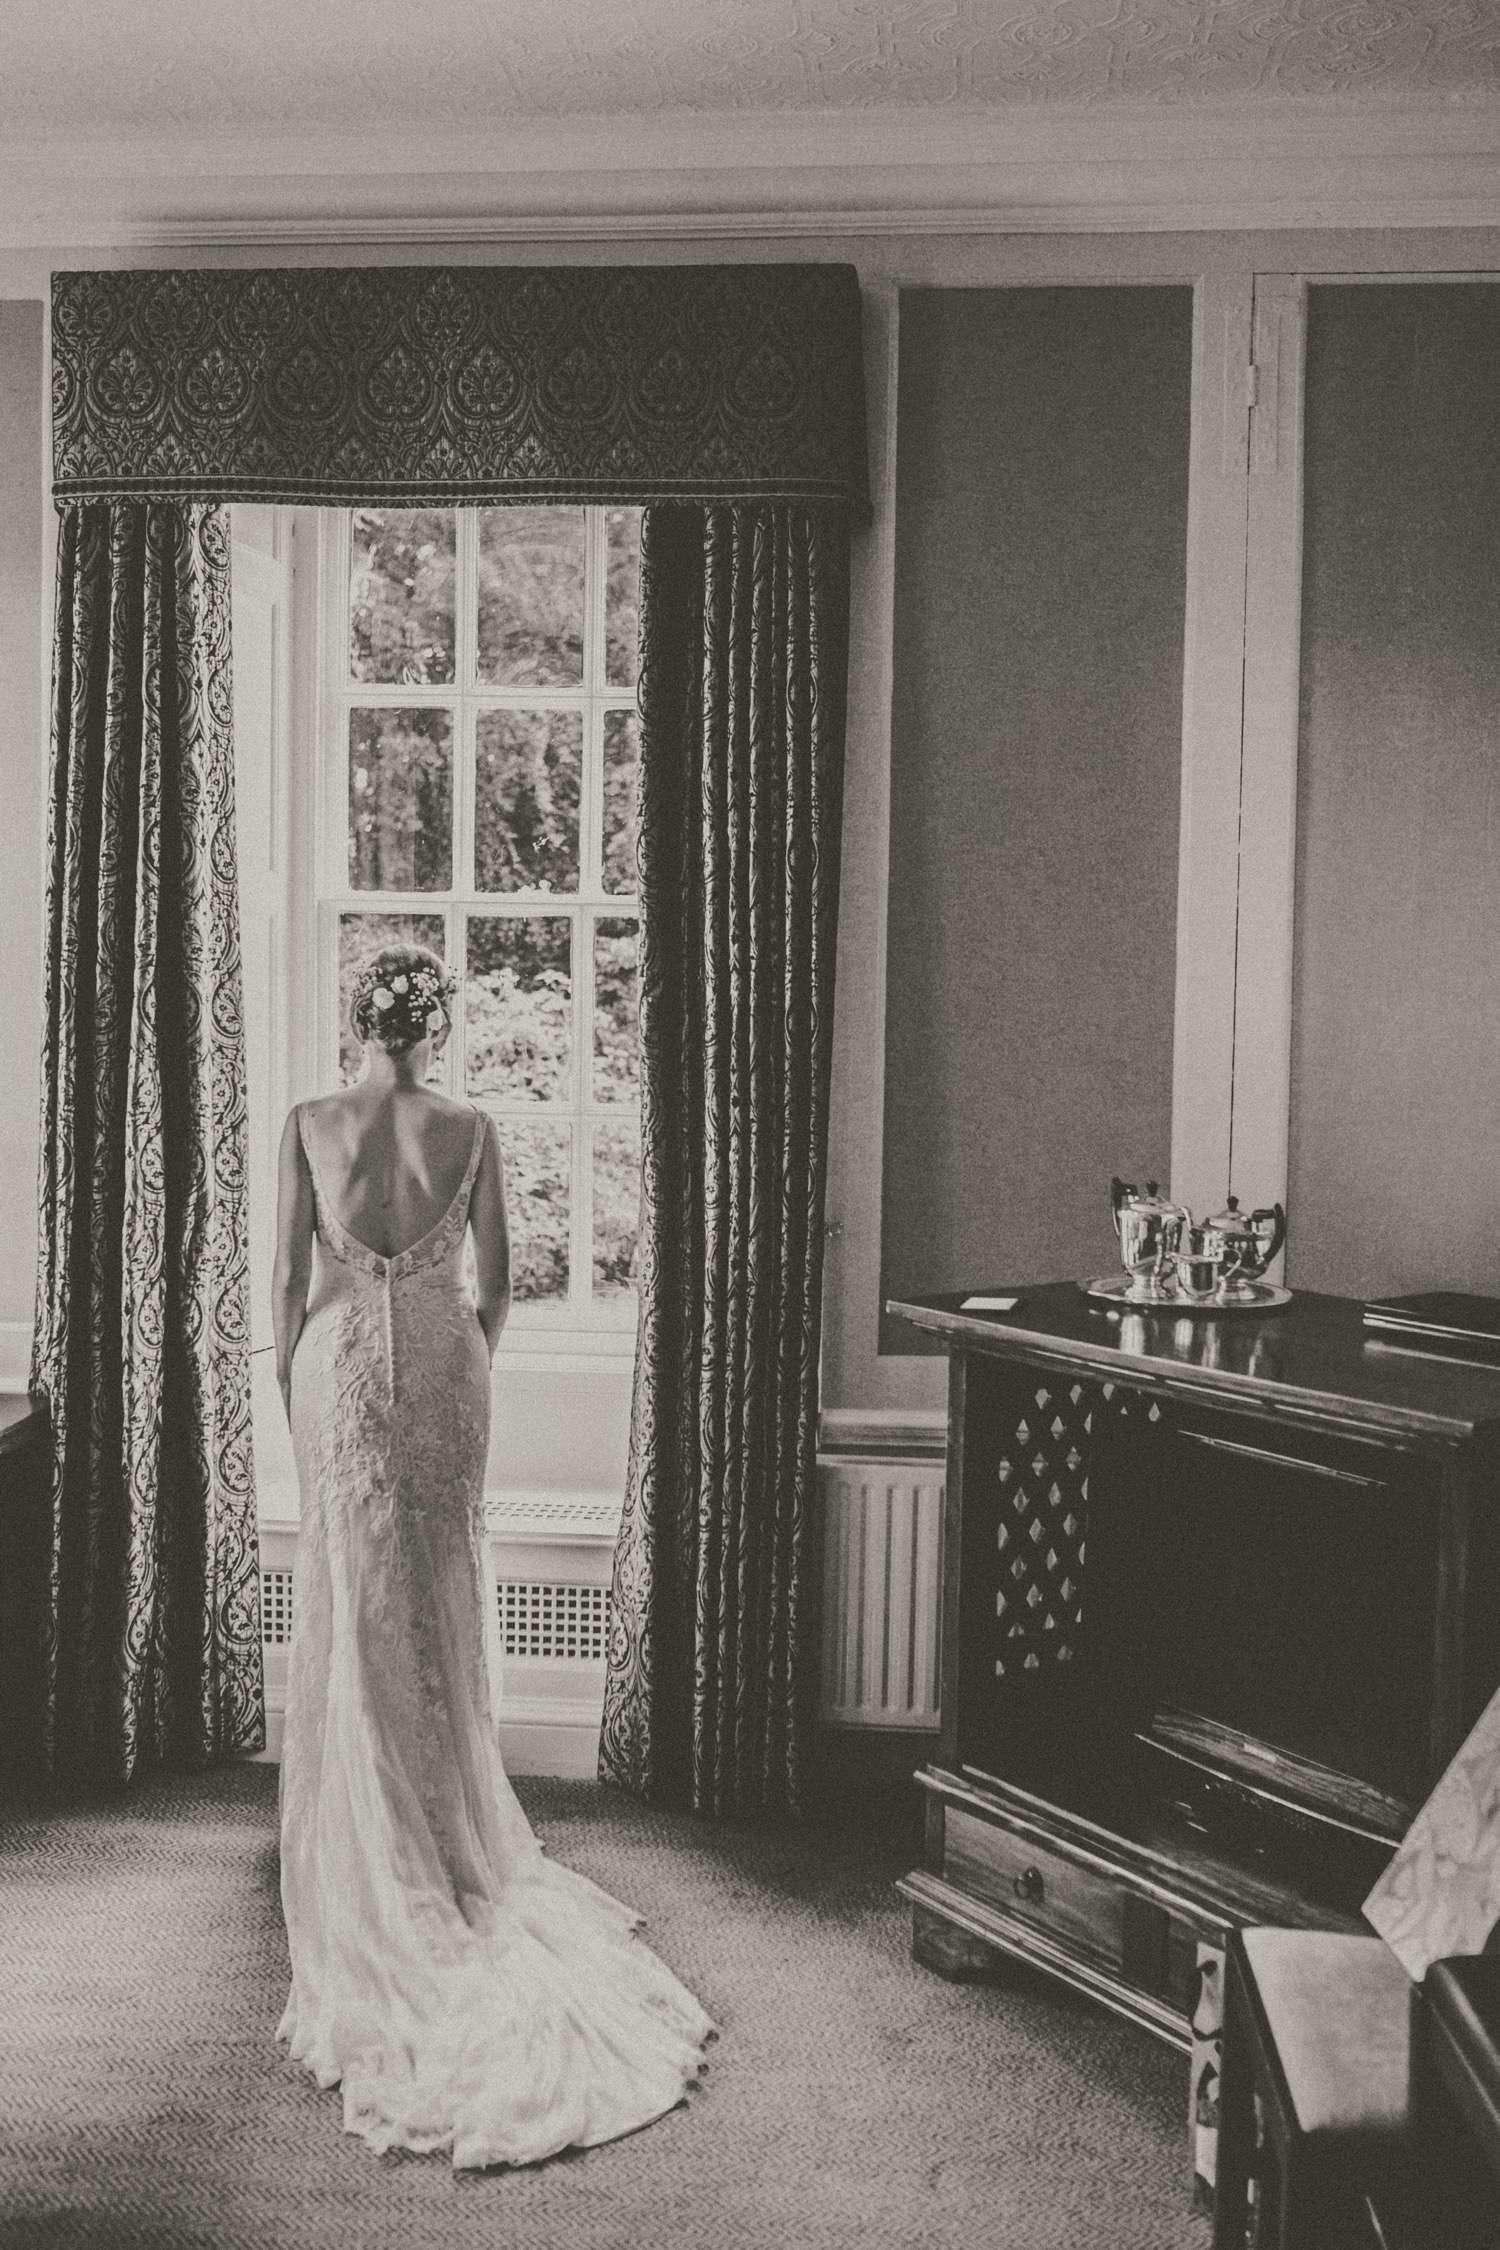 The Stylish Bride // Alex Brien // 17 Jun  Headlam Hall